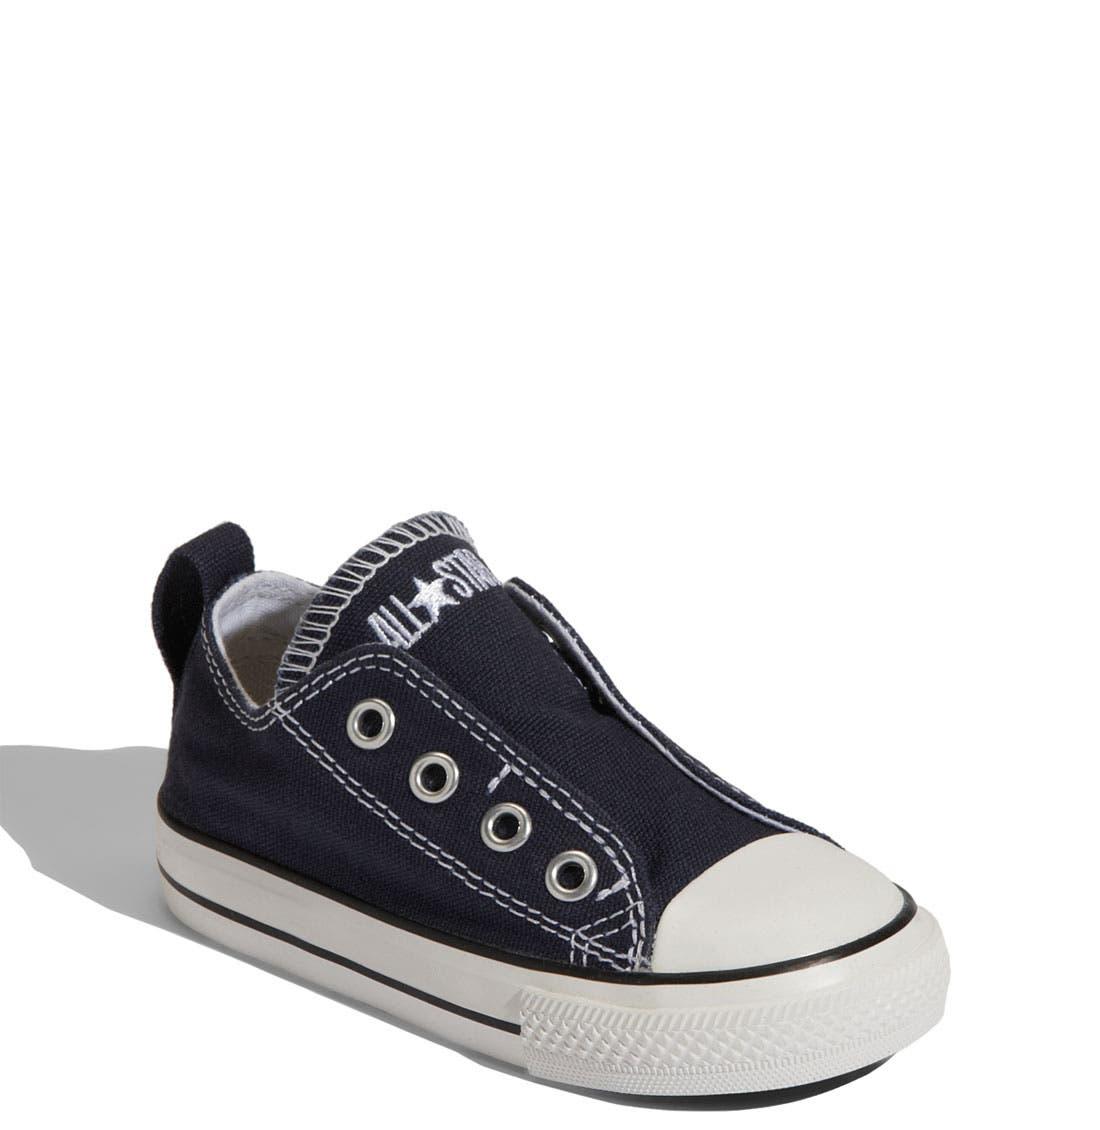 Alternate Image 1 Selected - Converse Chuck Taylor® Slip-On Sneaker (Baby, Walker & Toddler)